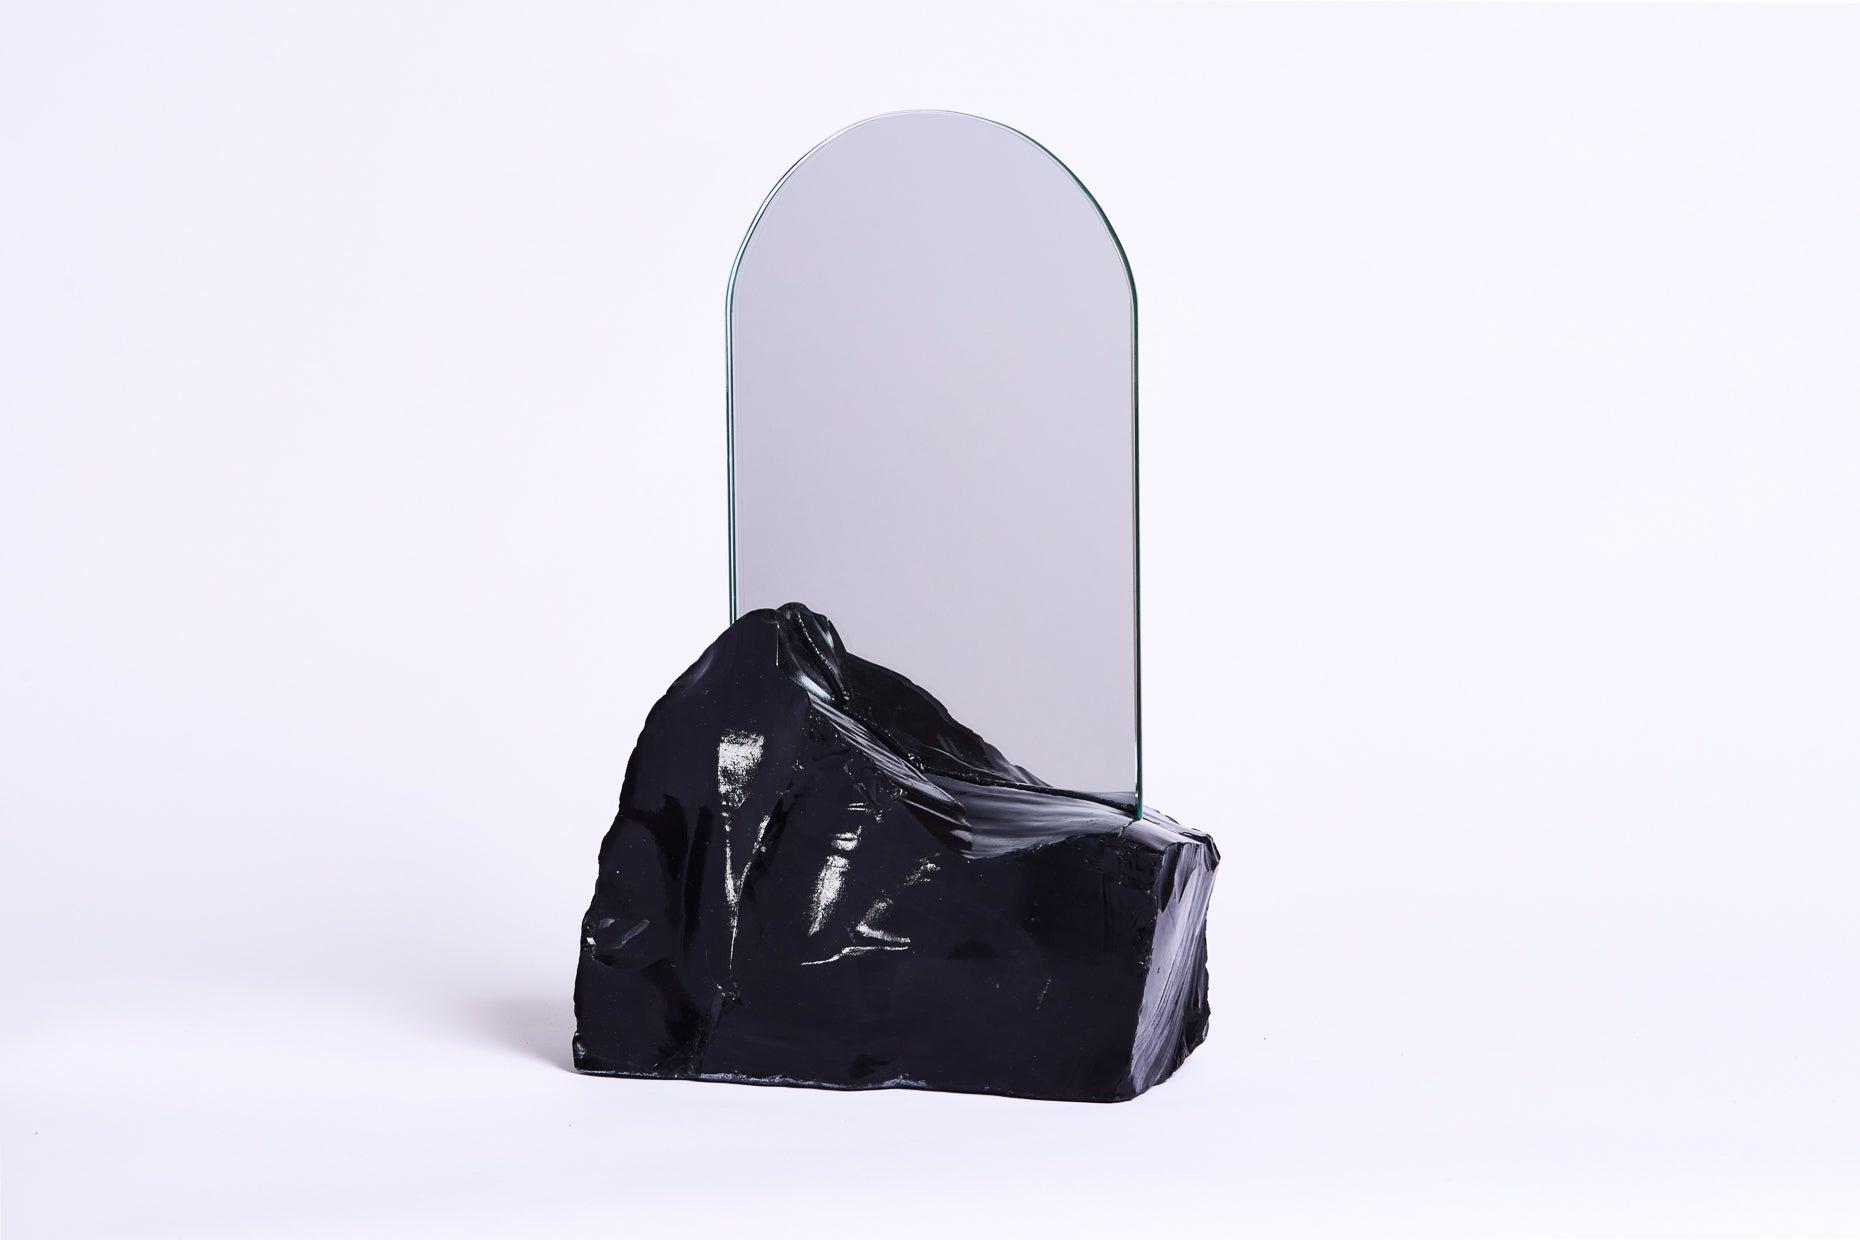 aura mirror antother human